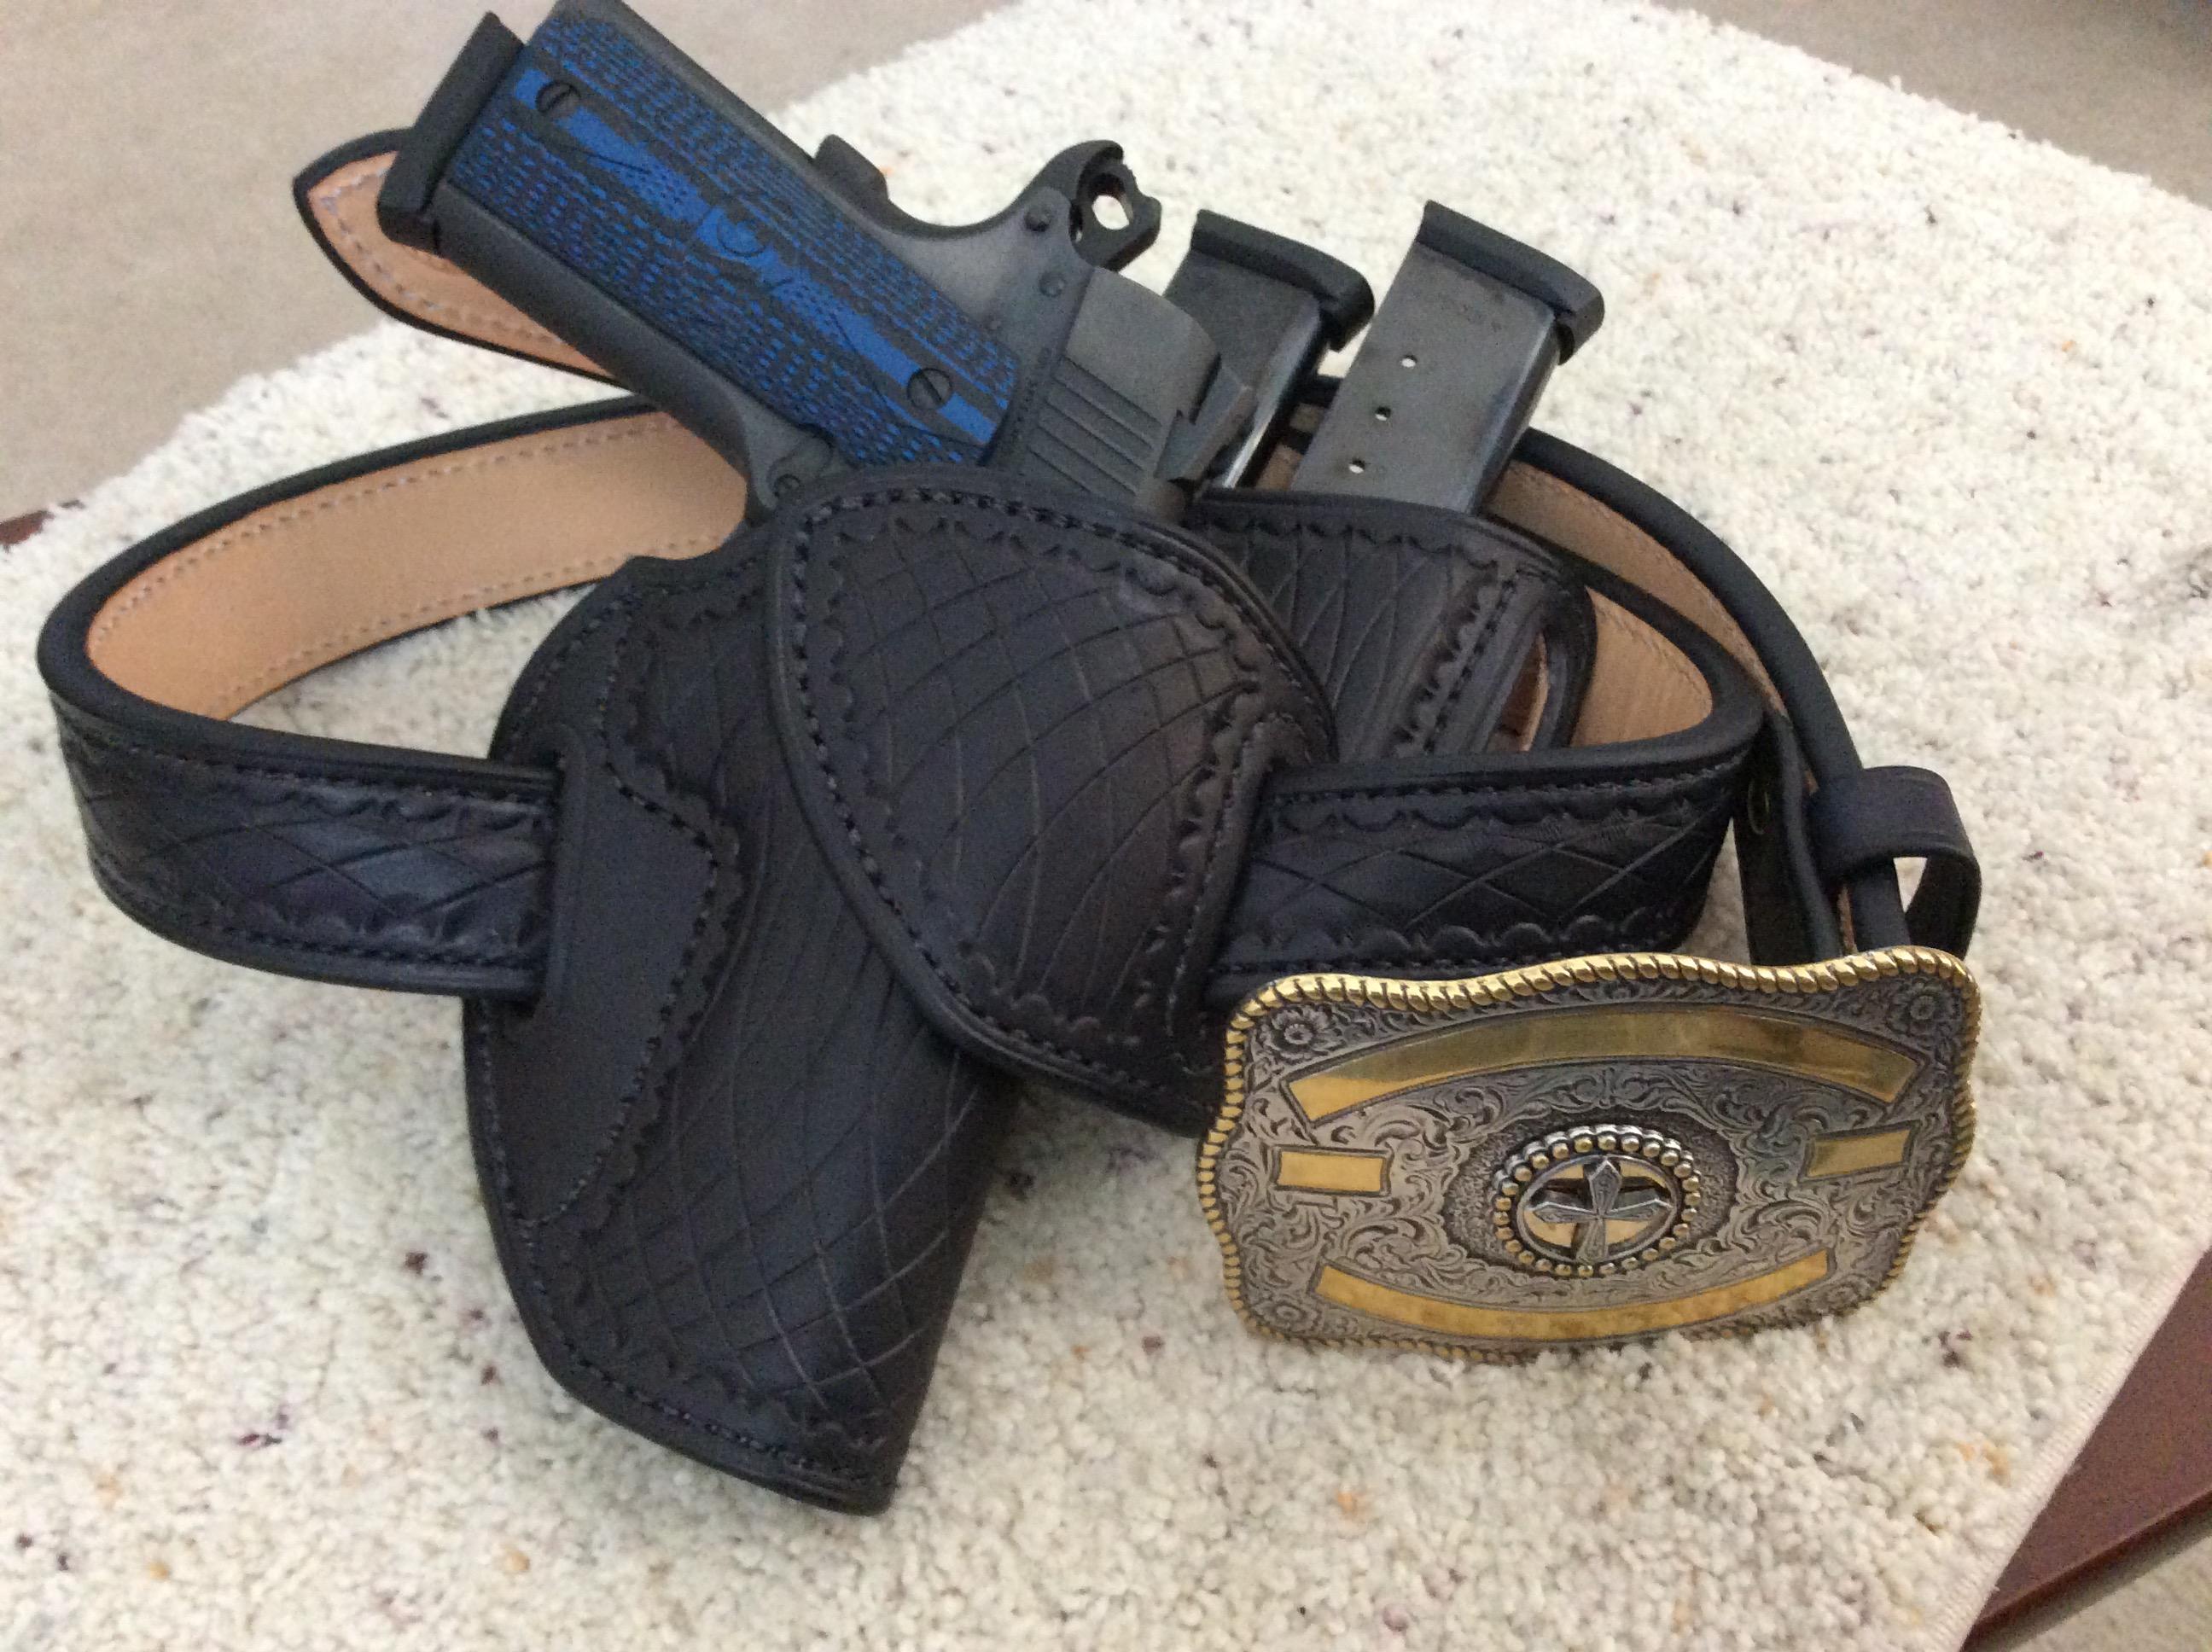 Anybody get anything good that's firearm related today?-20cc011b-d634-44b9-97ae-b998f2fbc3b4.jpeg